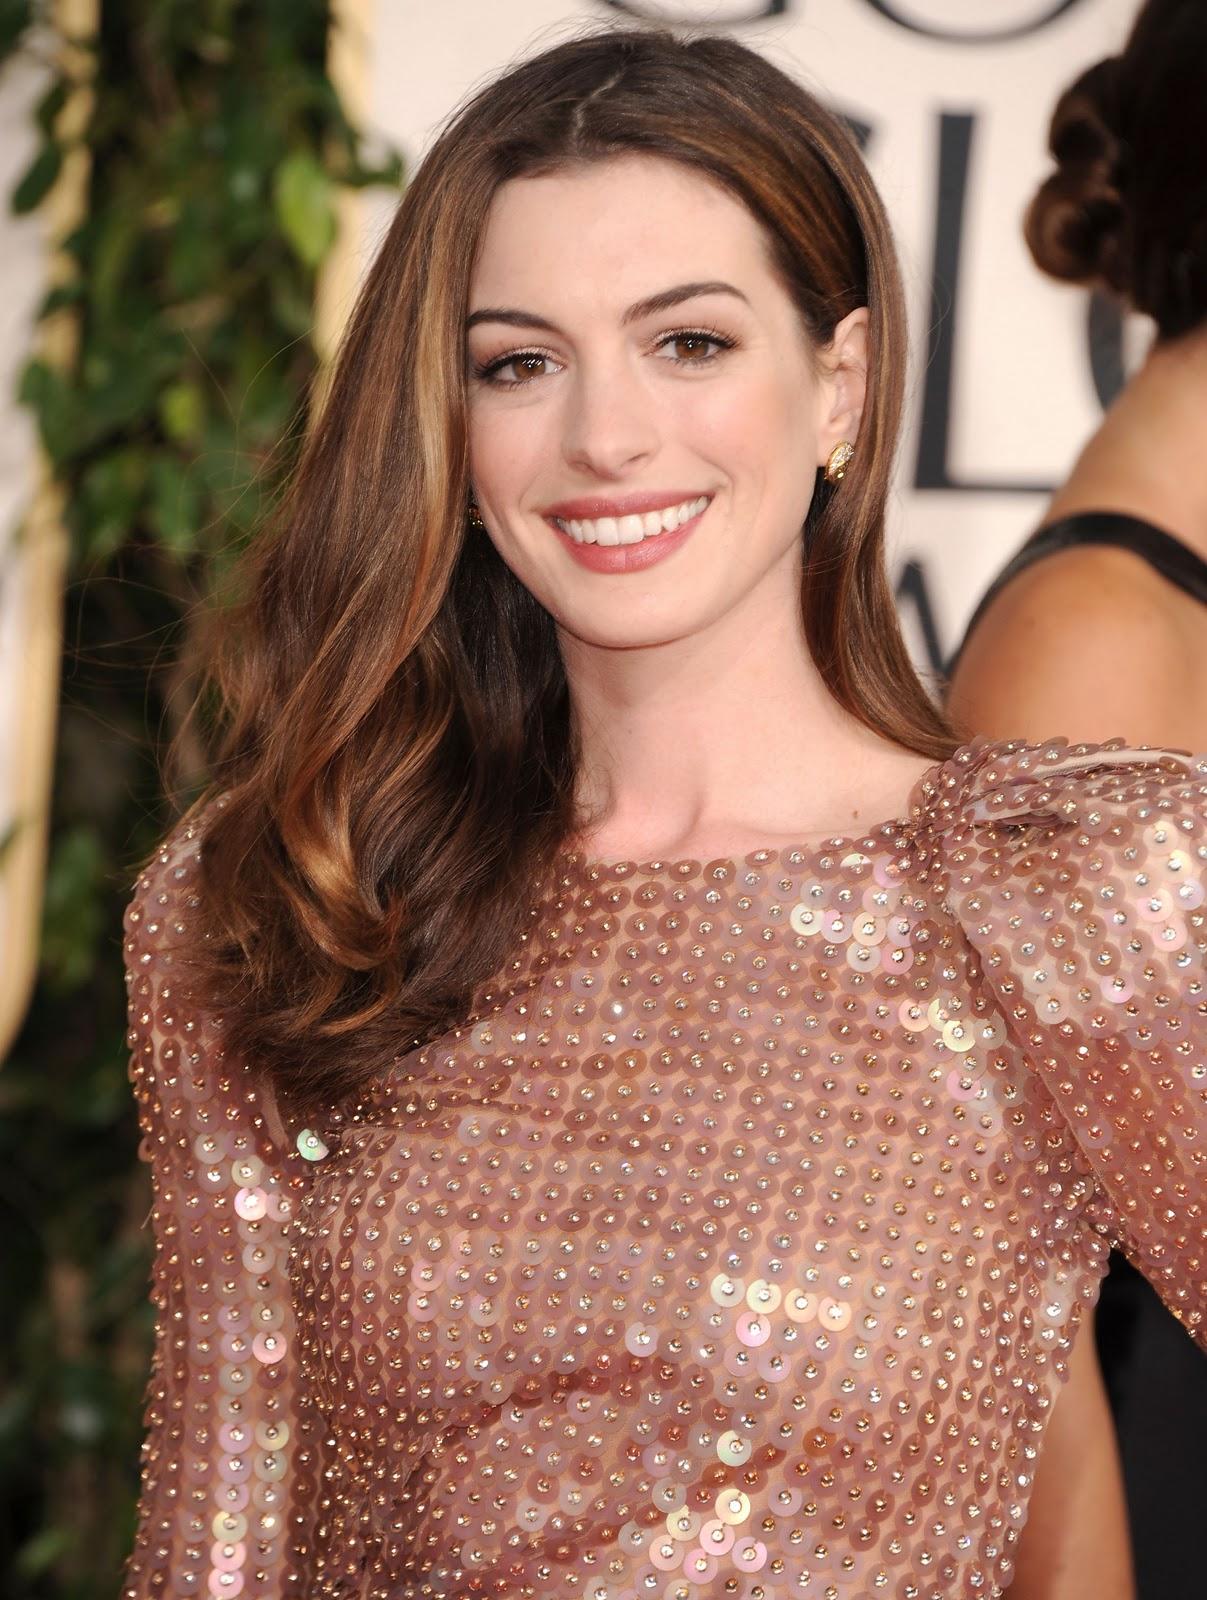 Kstelin Celebrity Inspired Anne Hathaway